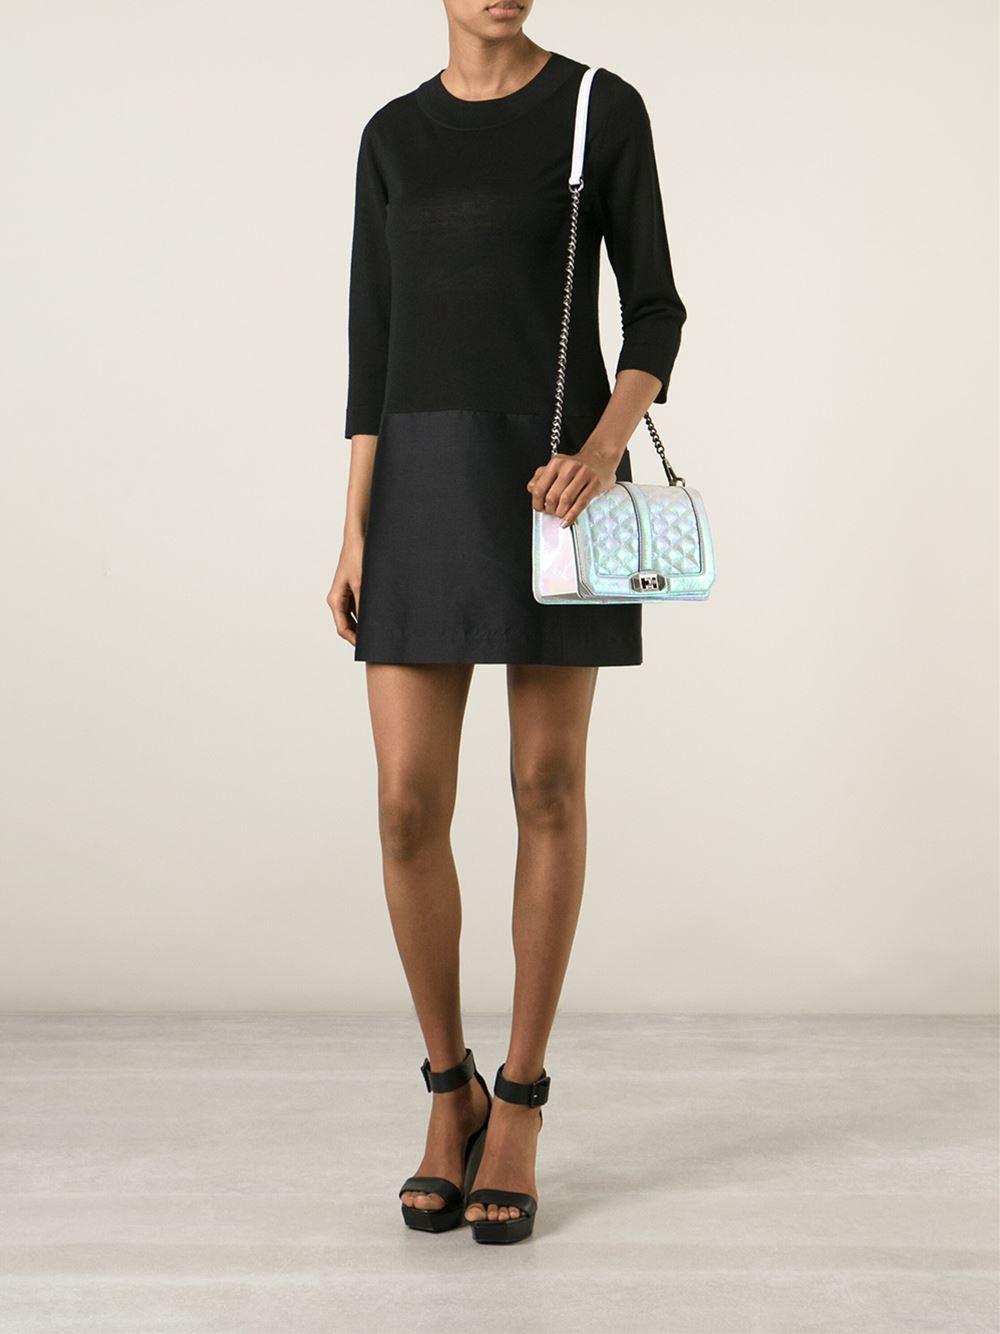 Lyst Rebecca Minkoff Love Iridescent Crossbody Bag In